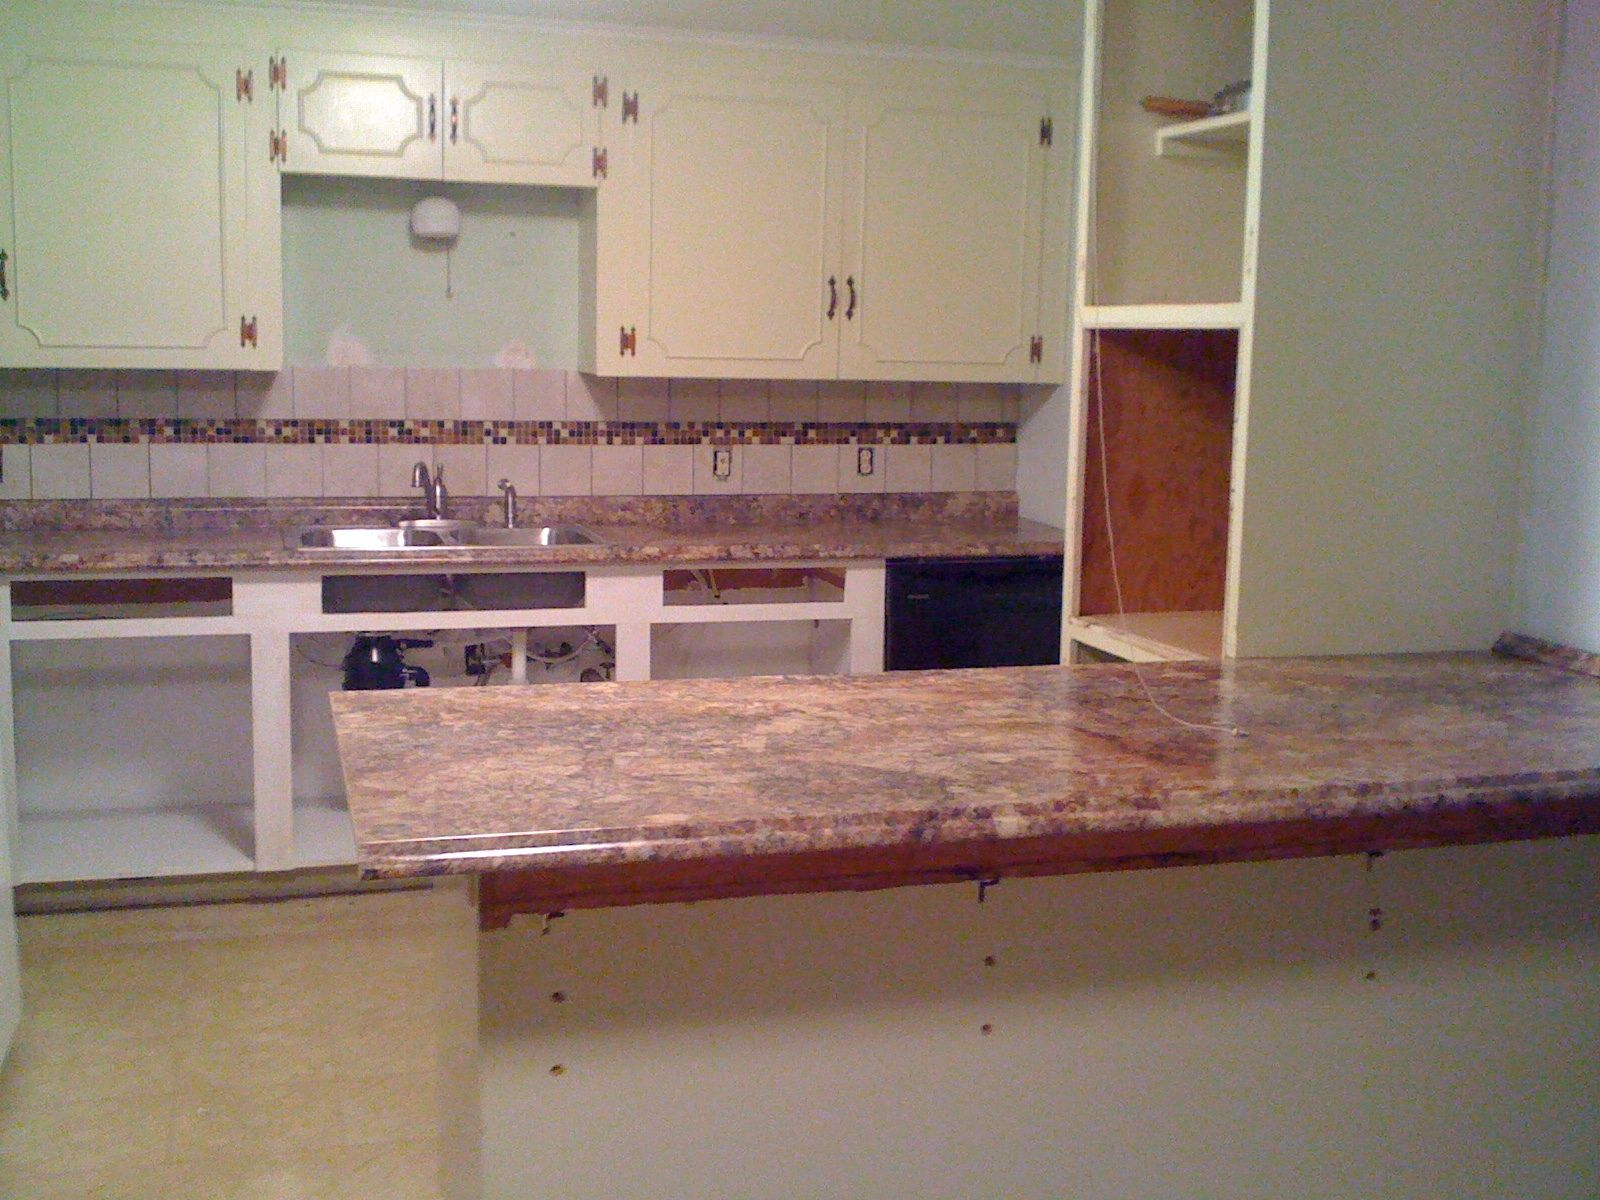 Dad's Kitchen remodel beginnings | Remodeling | Pinterest | Dads ...